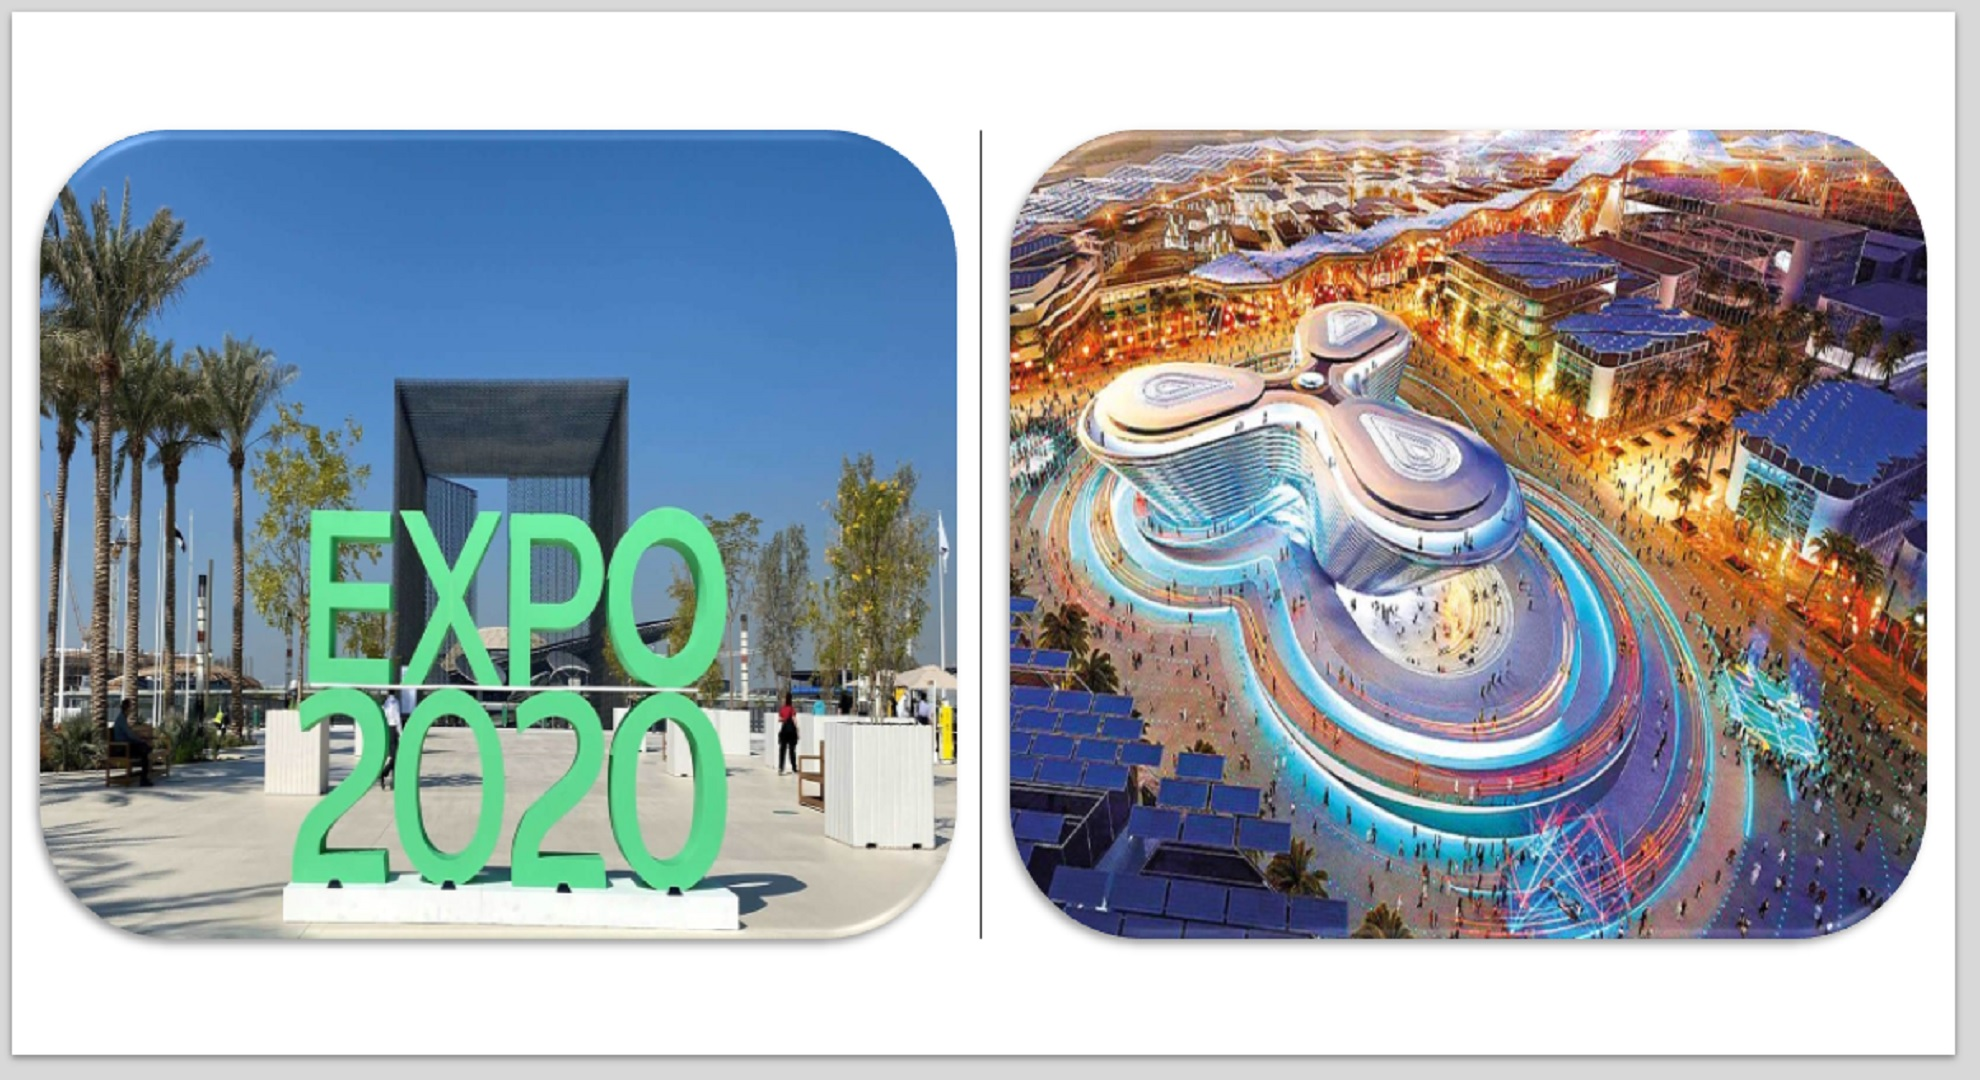 Tour Of Expo 2020 Dubai 5N / 6D